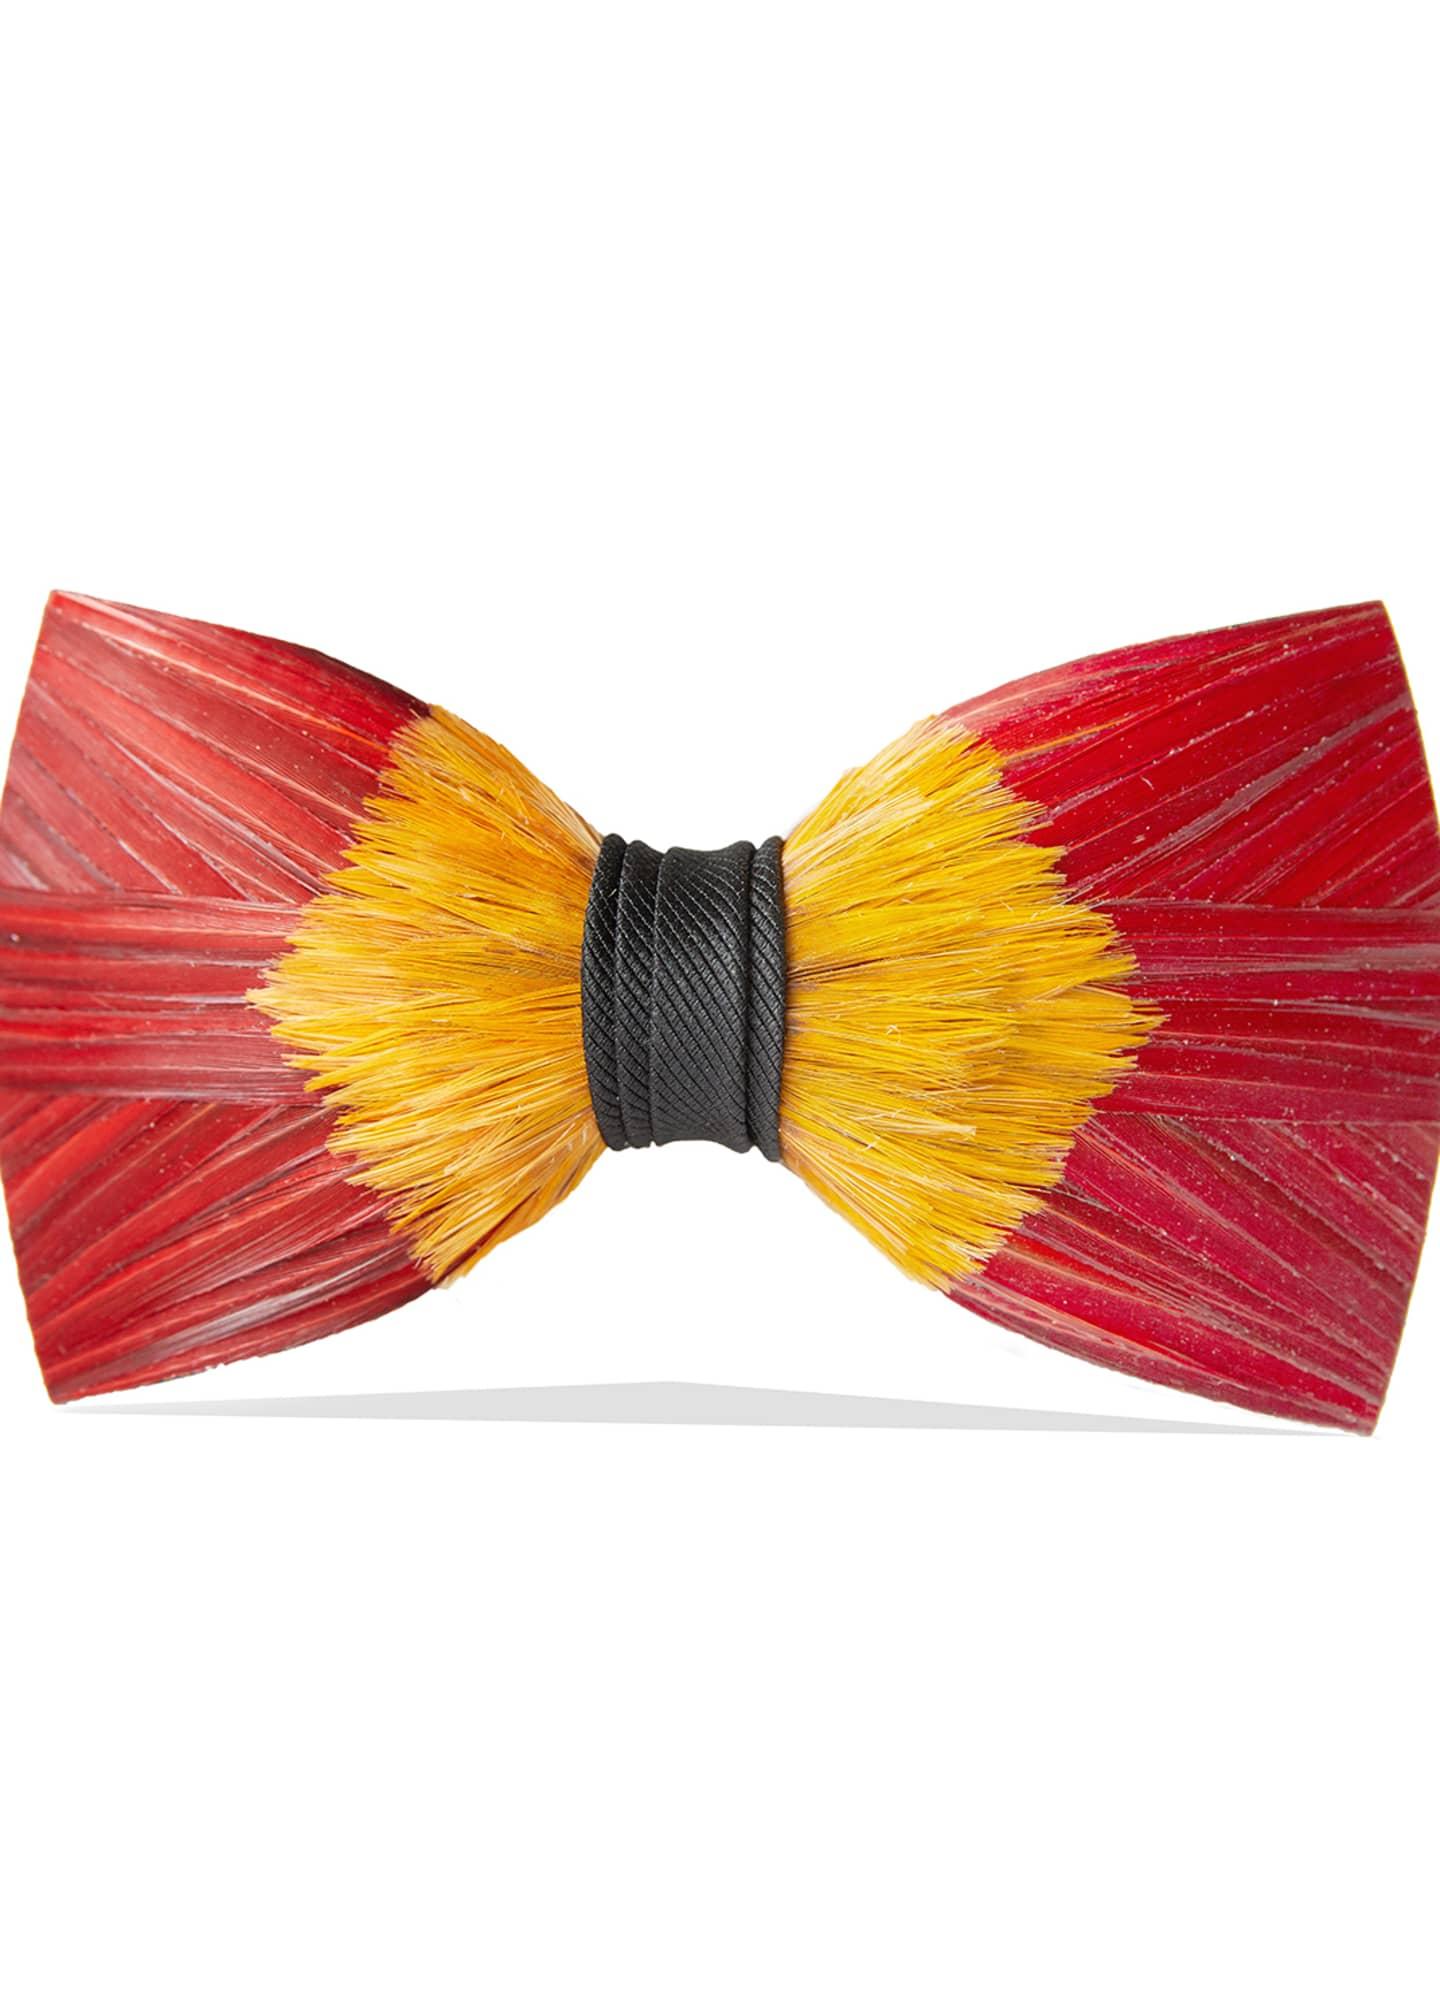 Brackish Bowties Starfire Feather Formal Bow Tie